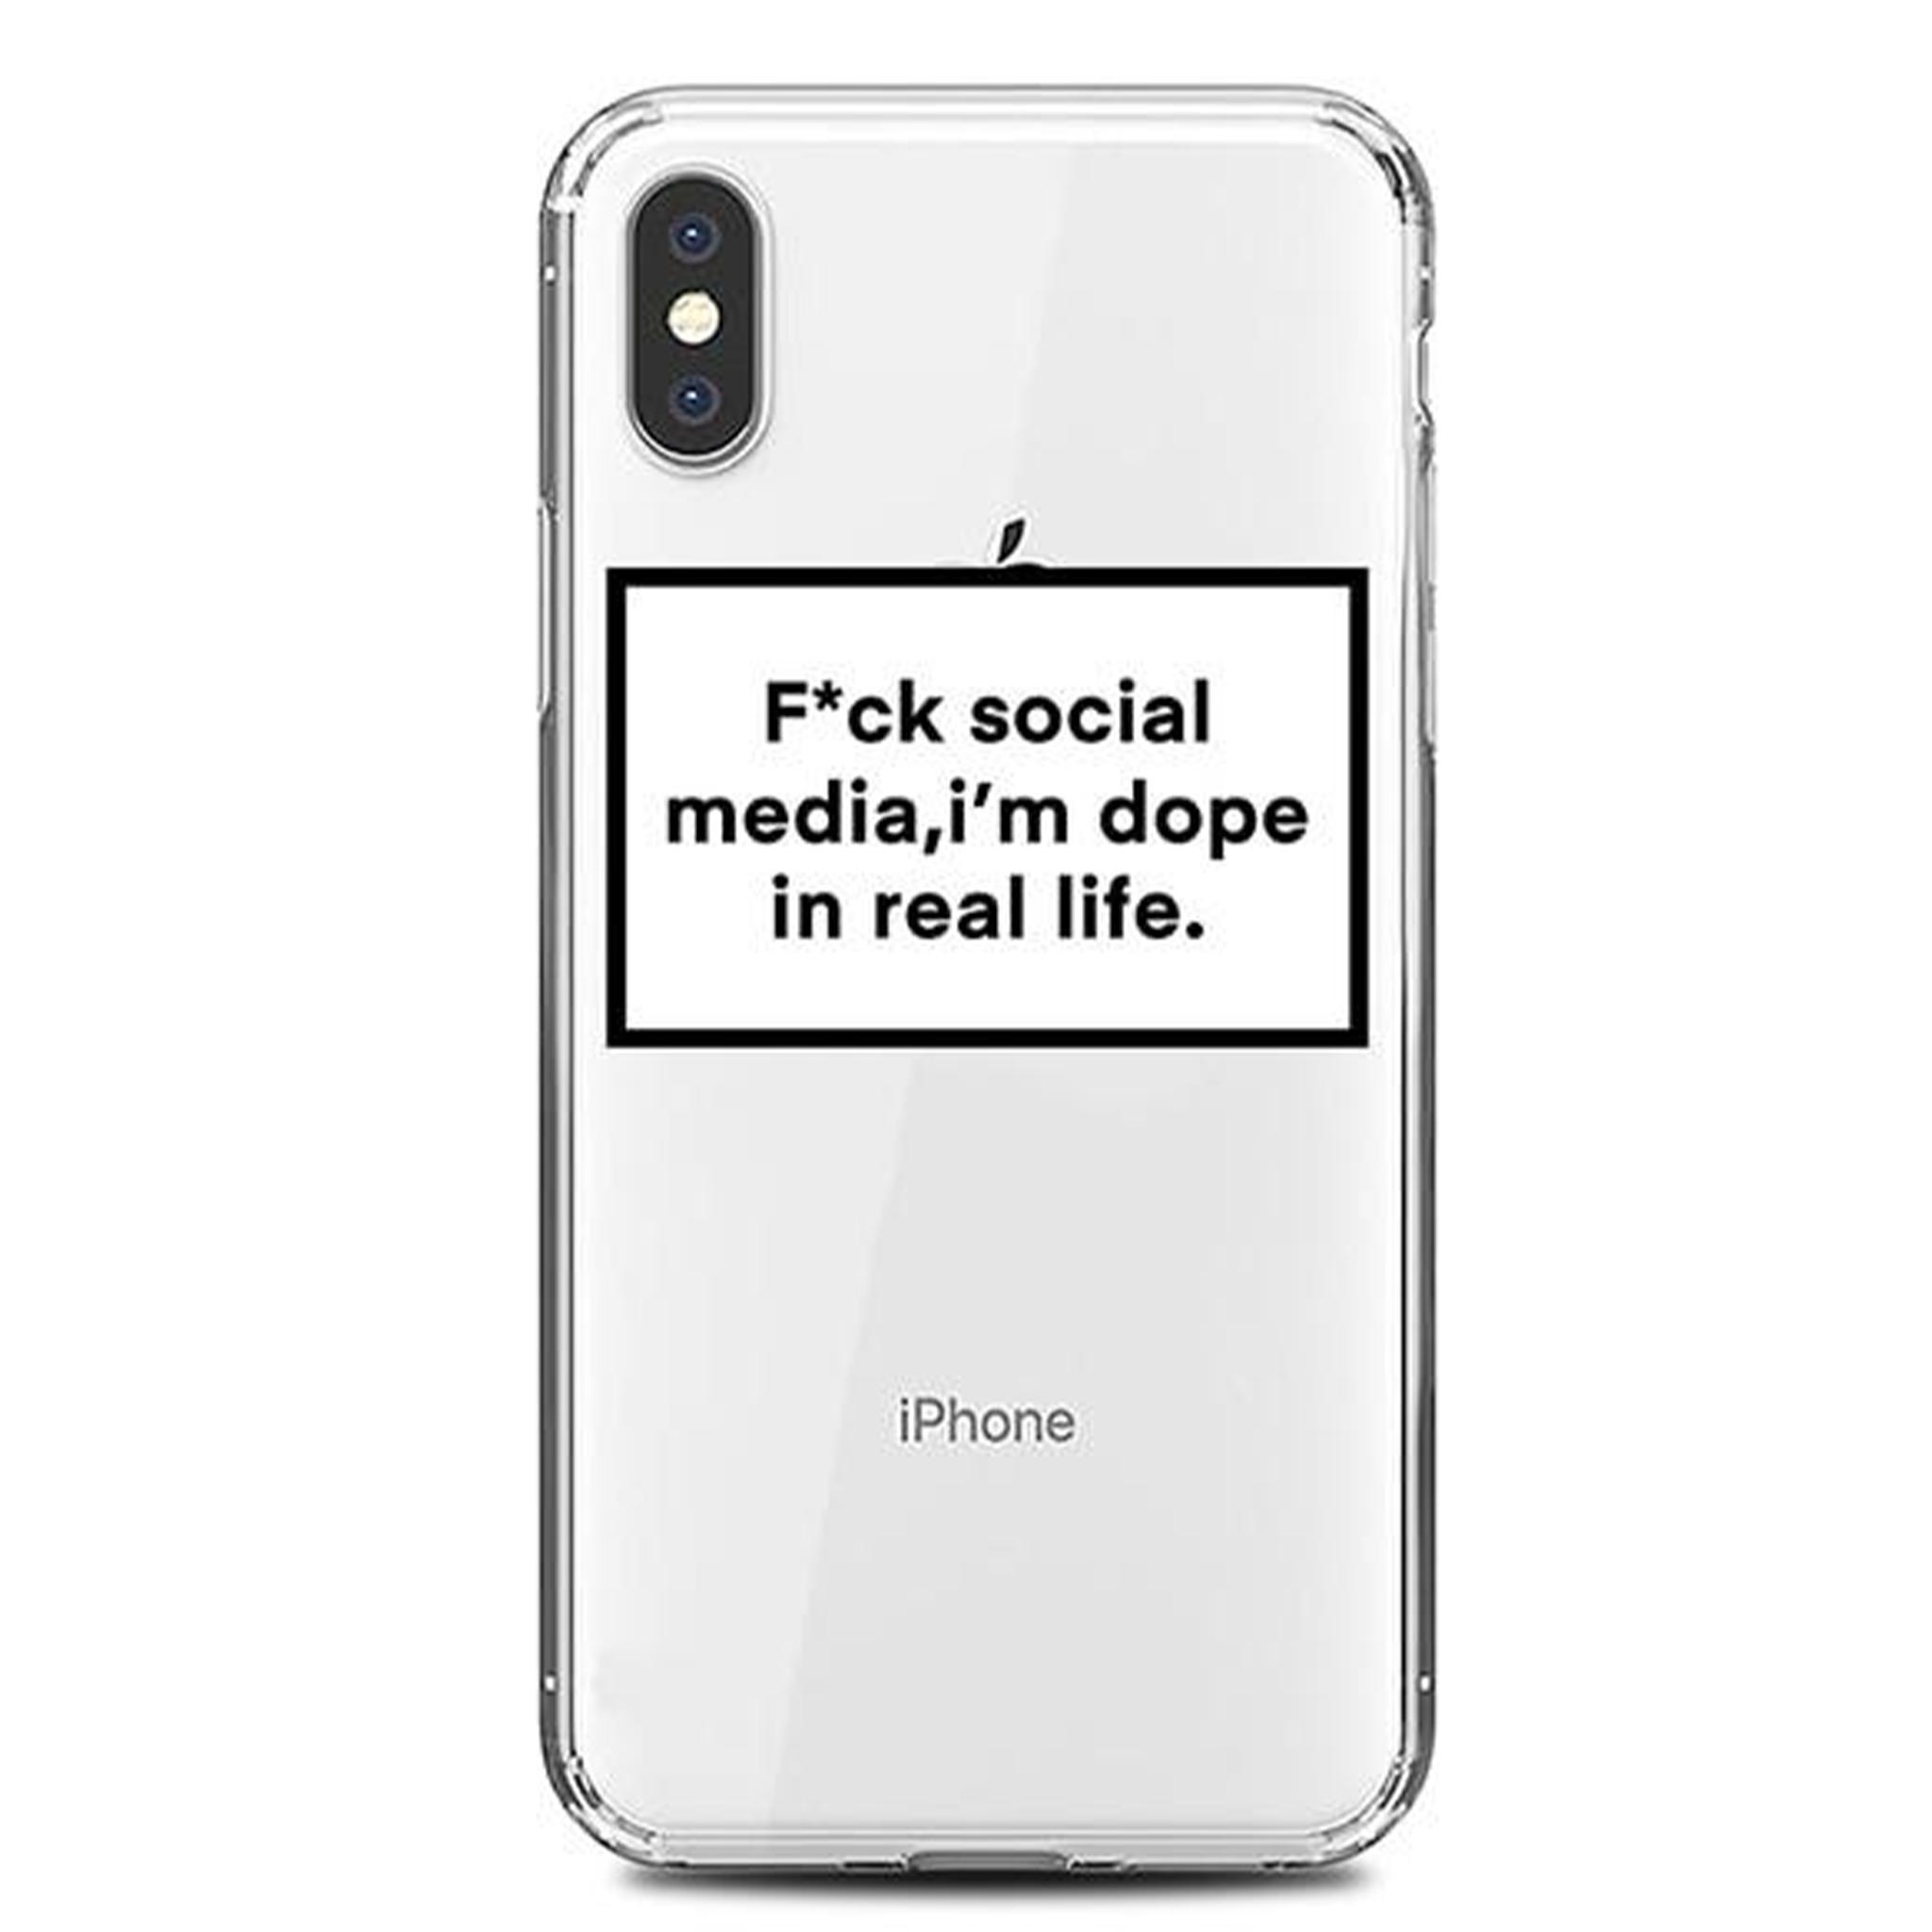 Dope IRL - Samsung Galaxy S9+